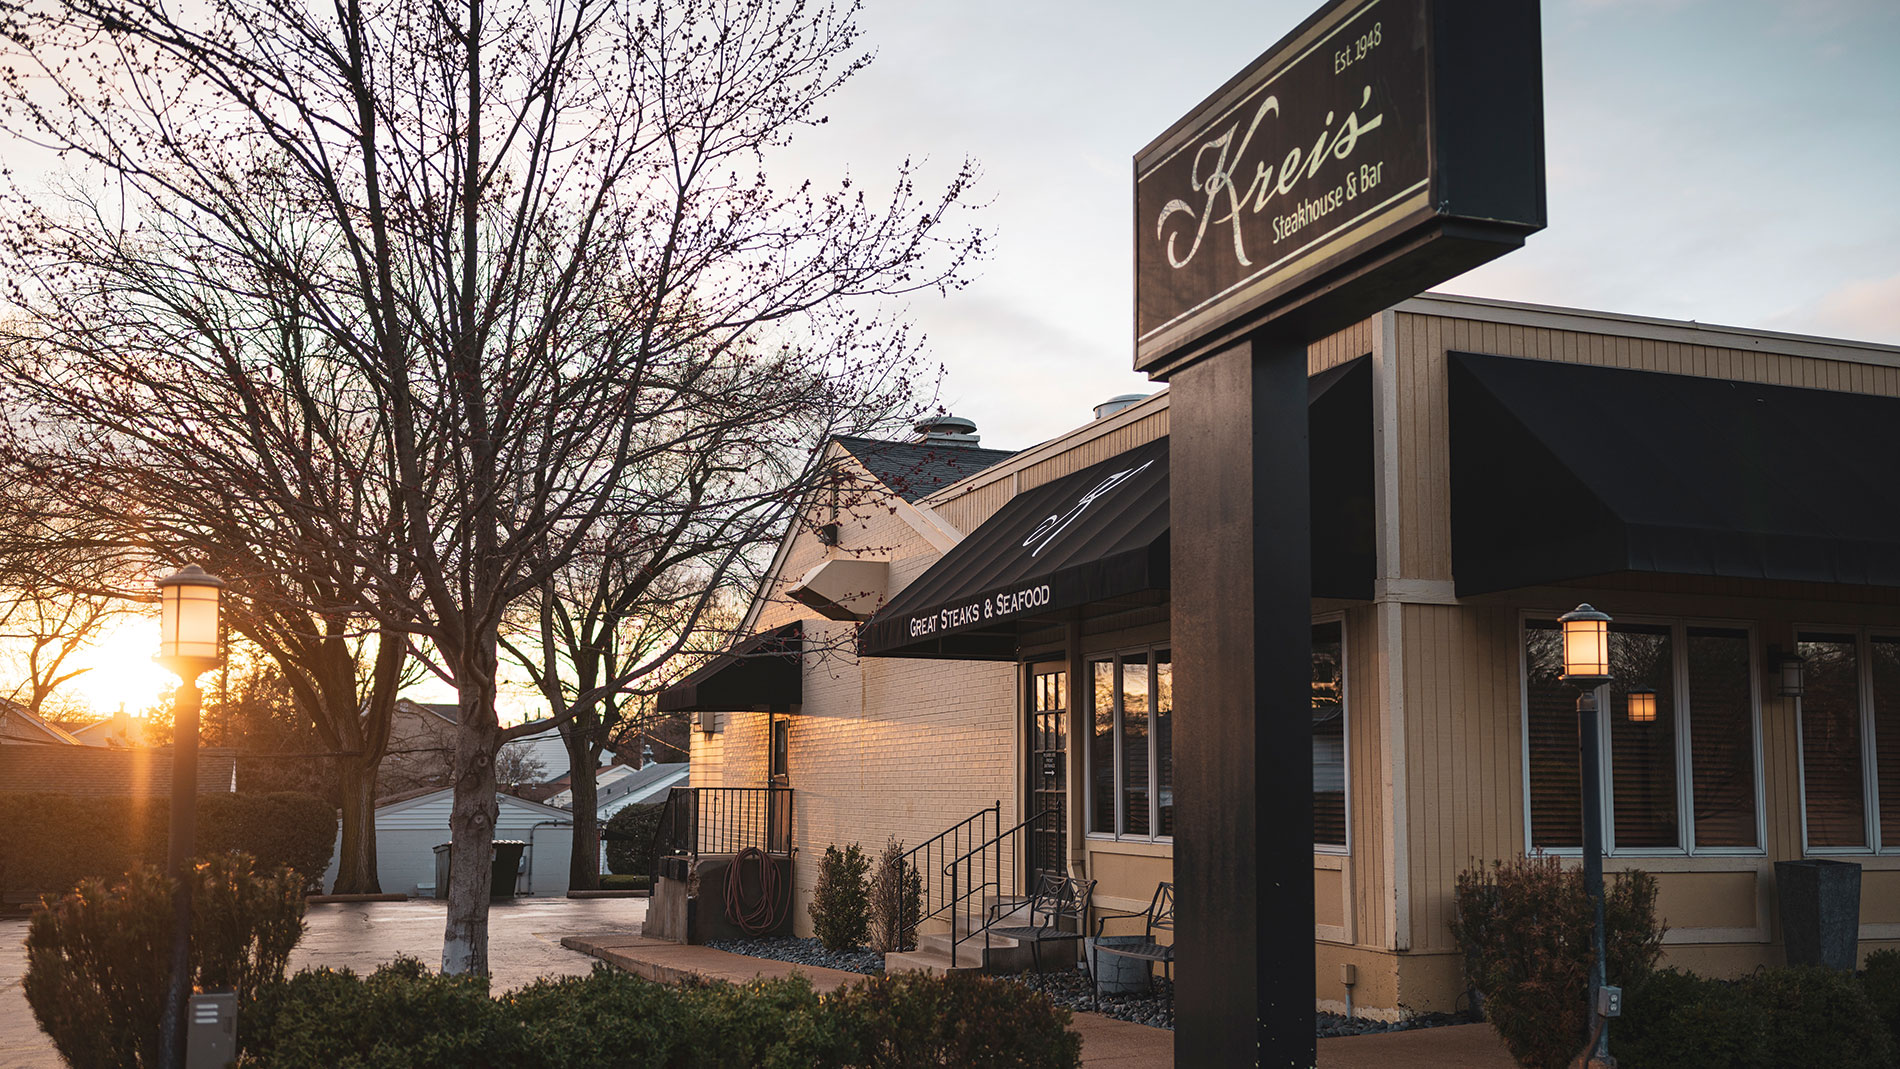 kreis' steakhouse and bar in frontenac in st. louis